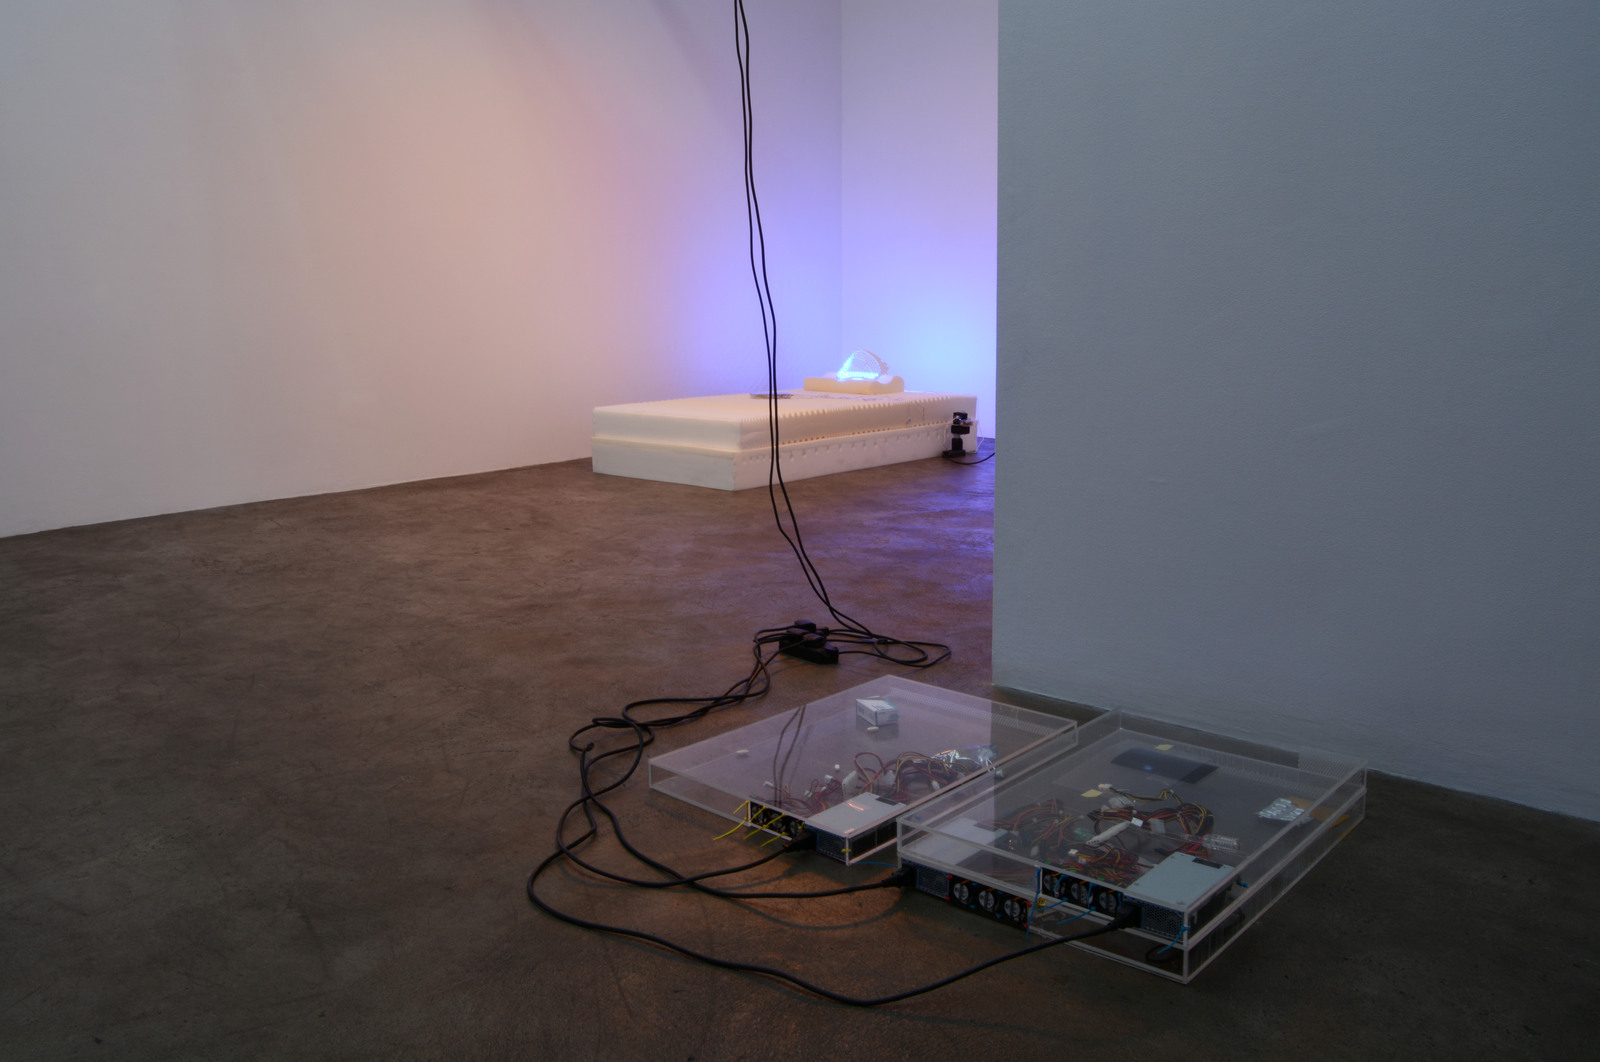 13. Yuri Pattison_sunset provision_installation view_memory foam remembers_dust,scraper, fan